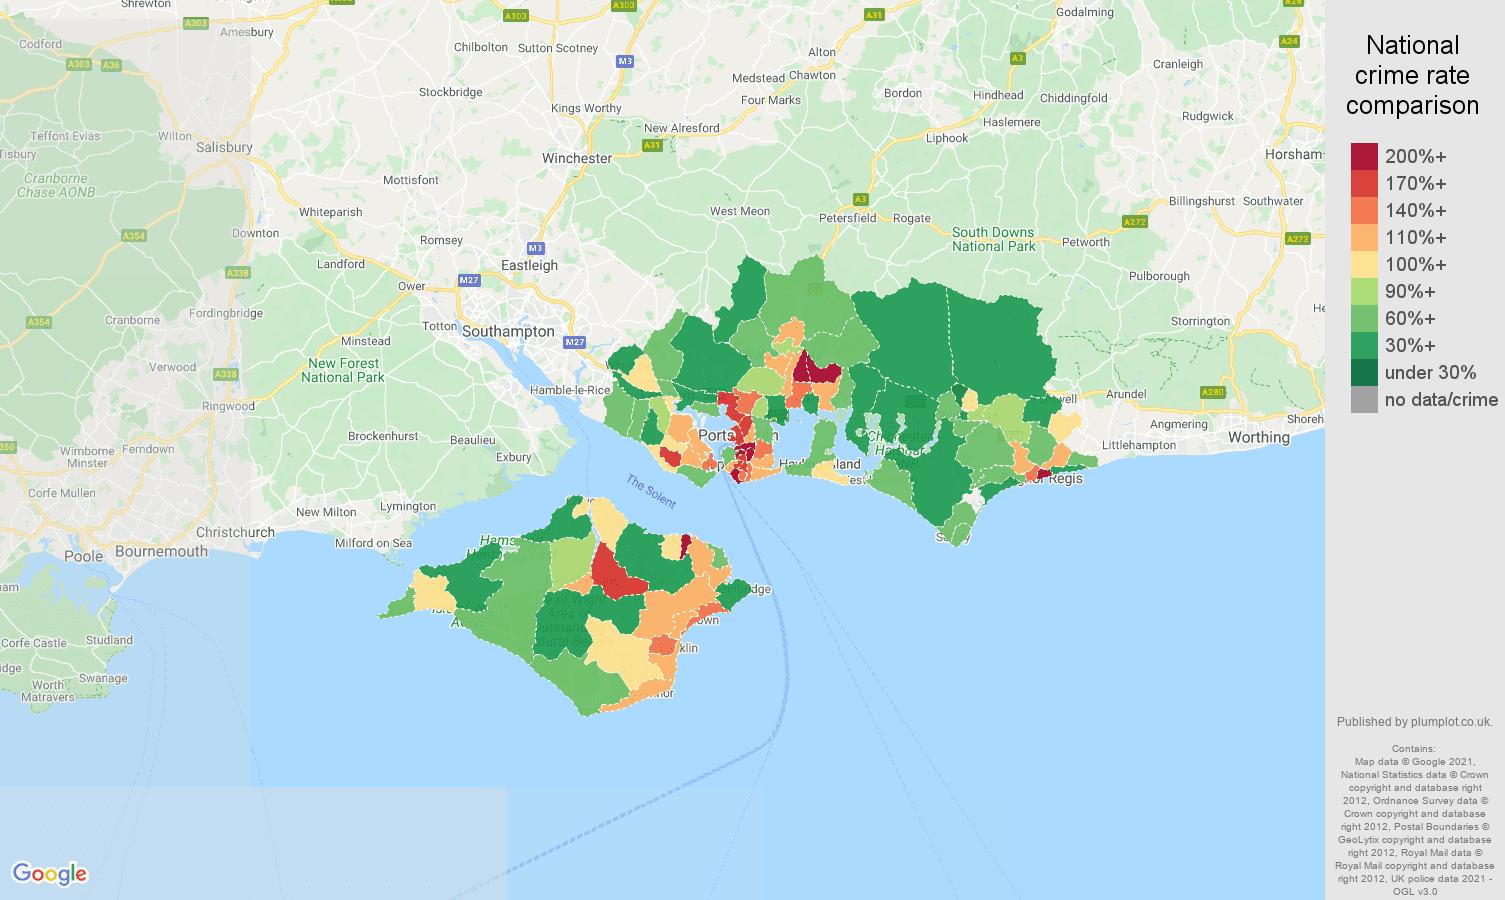 Portsmouth violent crime rate comparison map